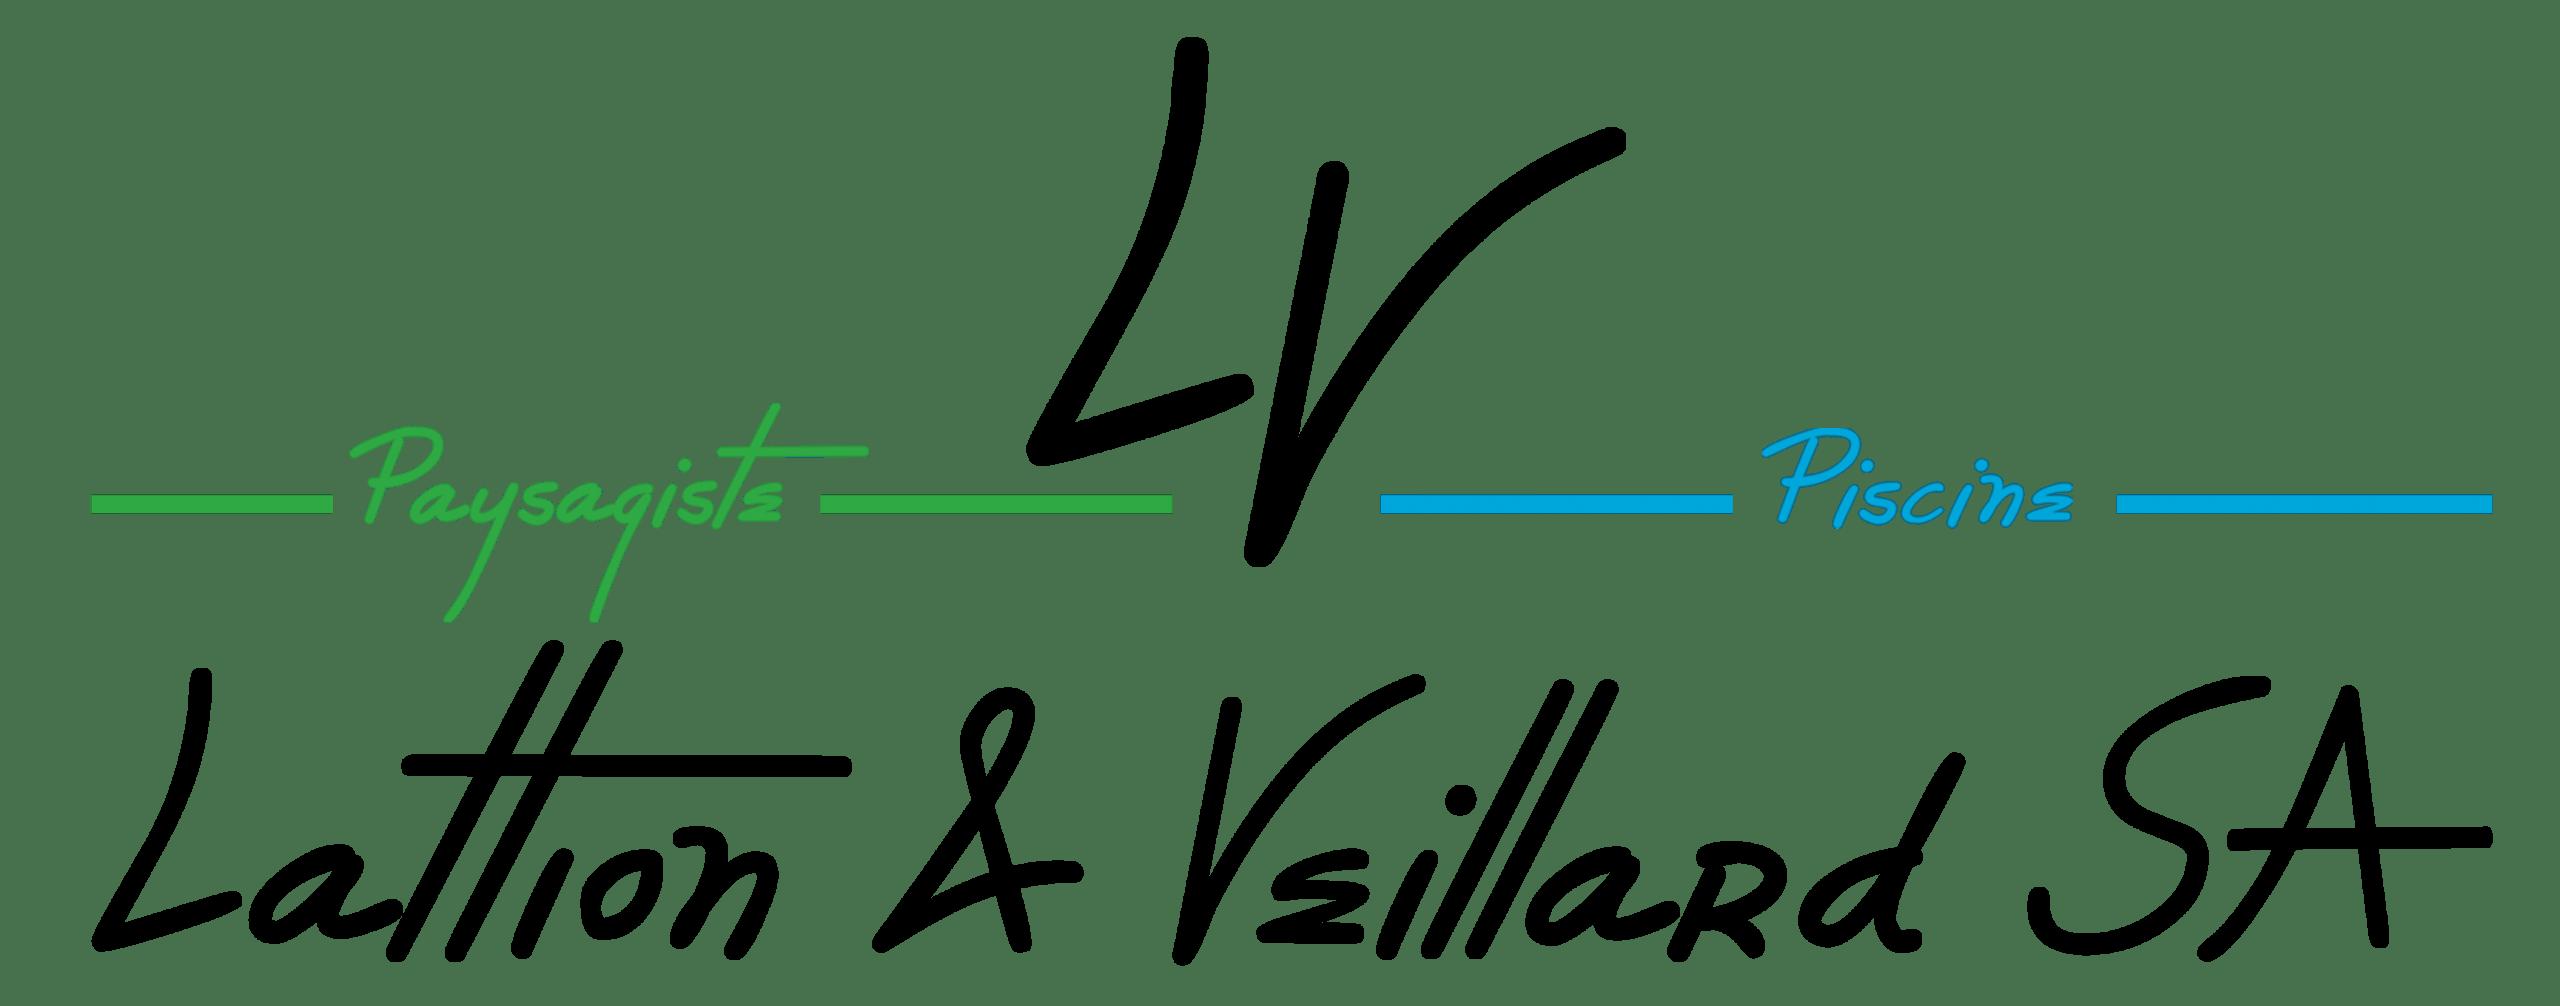 Logo Lattion et Veillard Paysagiste et Piscine